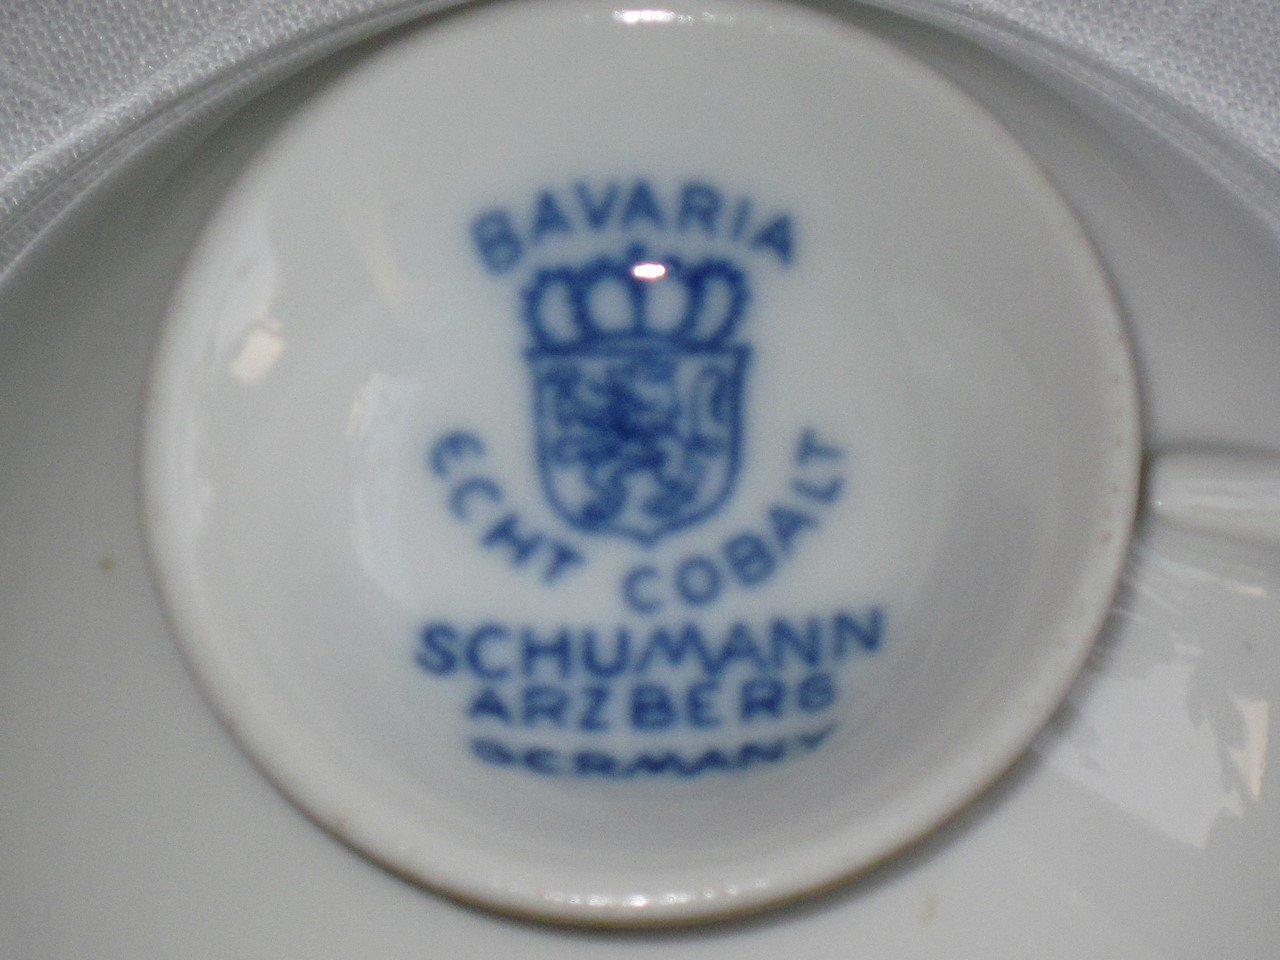 bavaria echt cobalt schumann arzberg germany sammeltassen gedeck. Black Bedroom Furniture Sets. Home Design Ideas